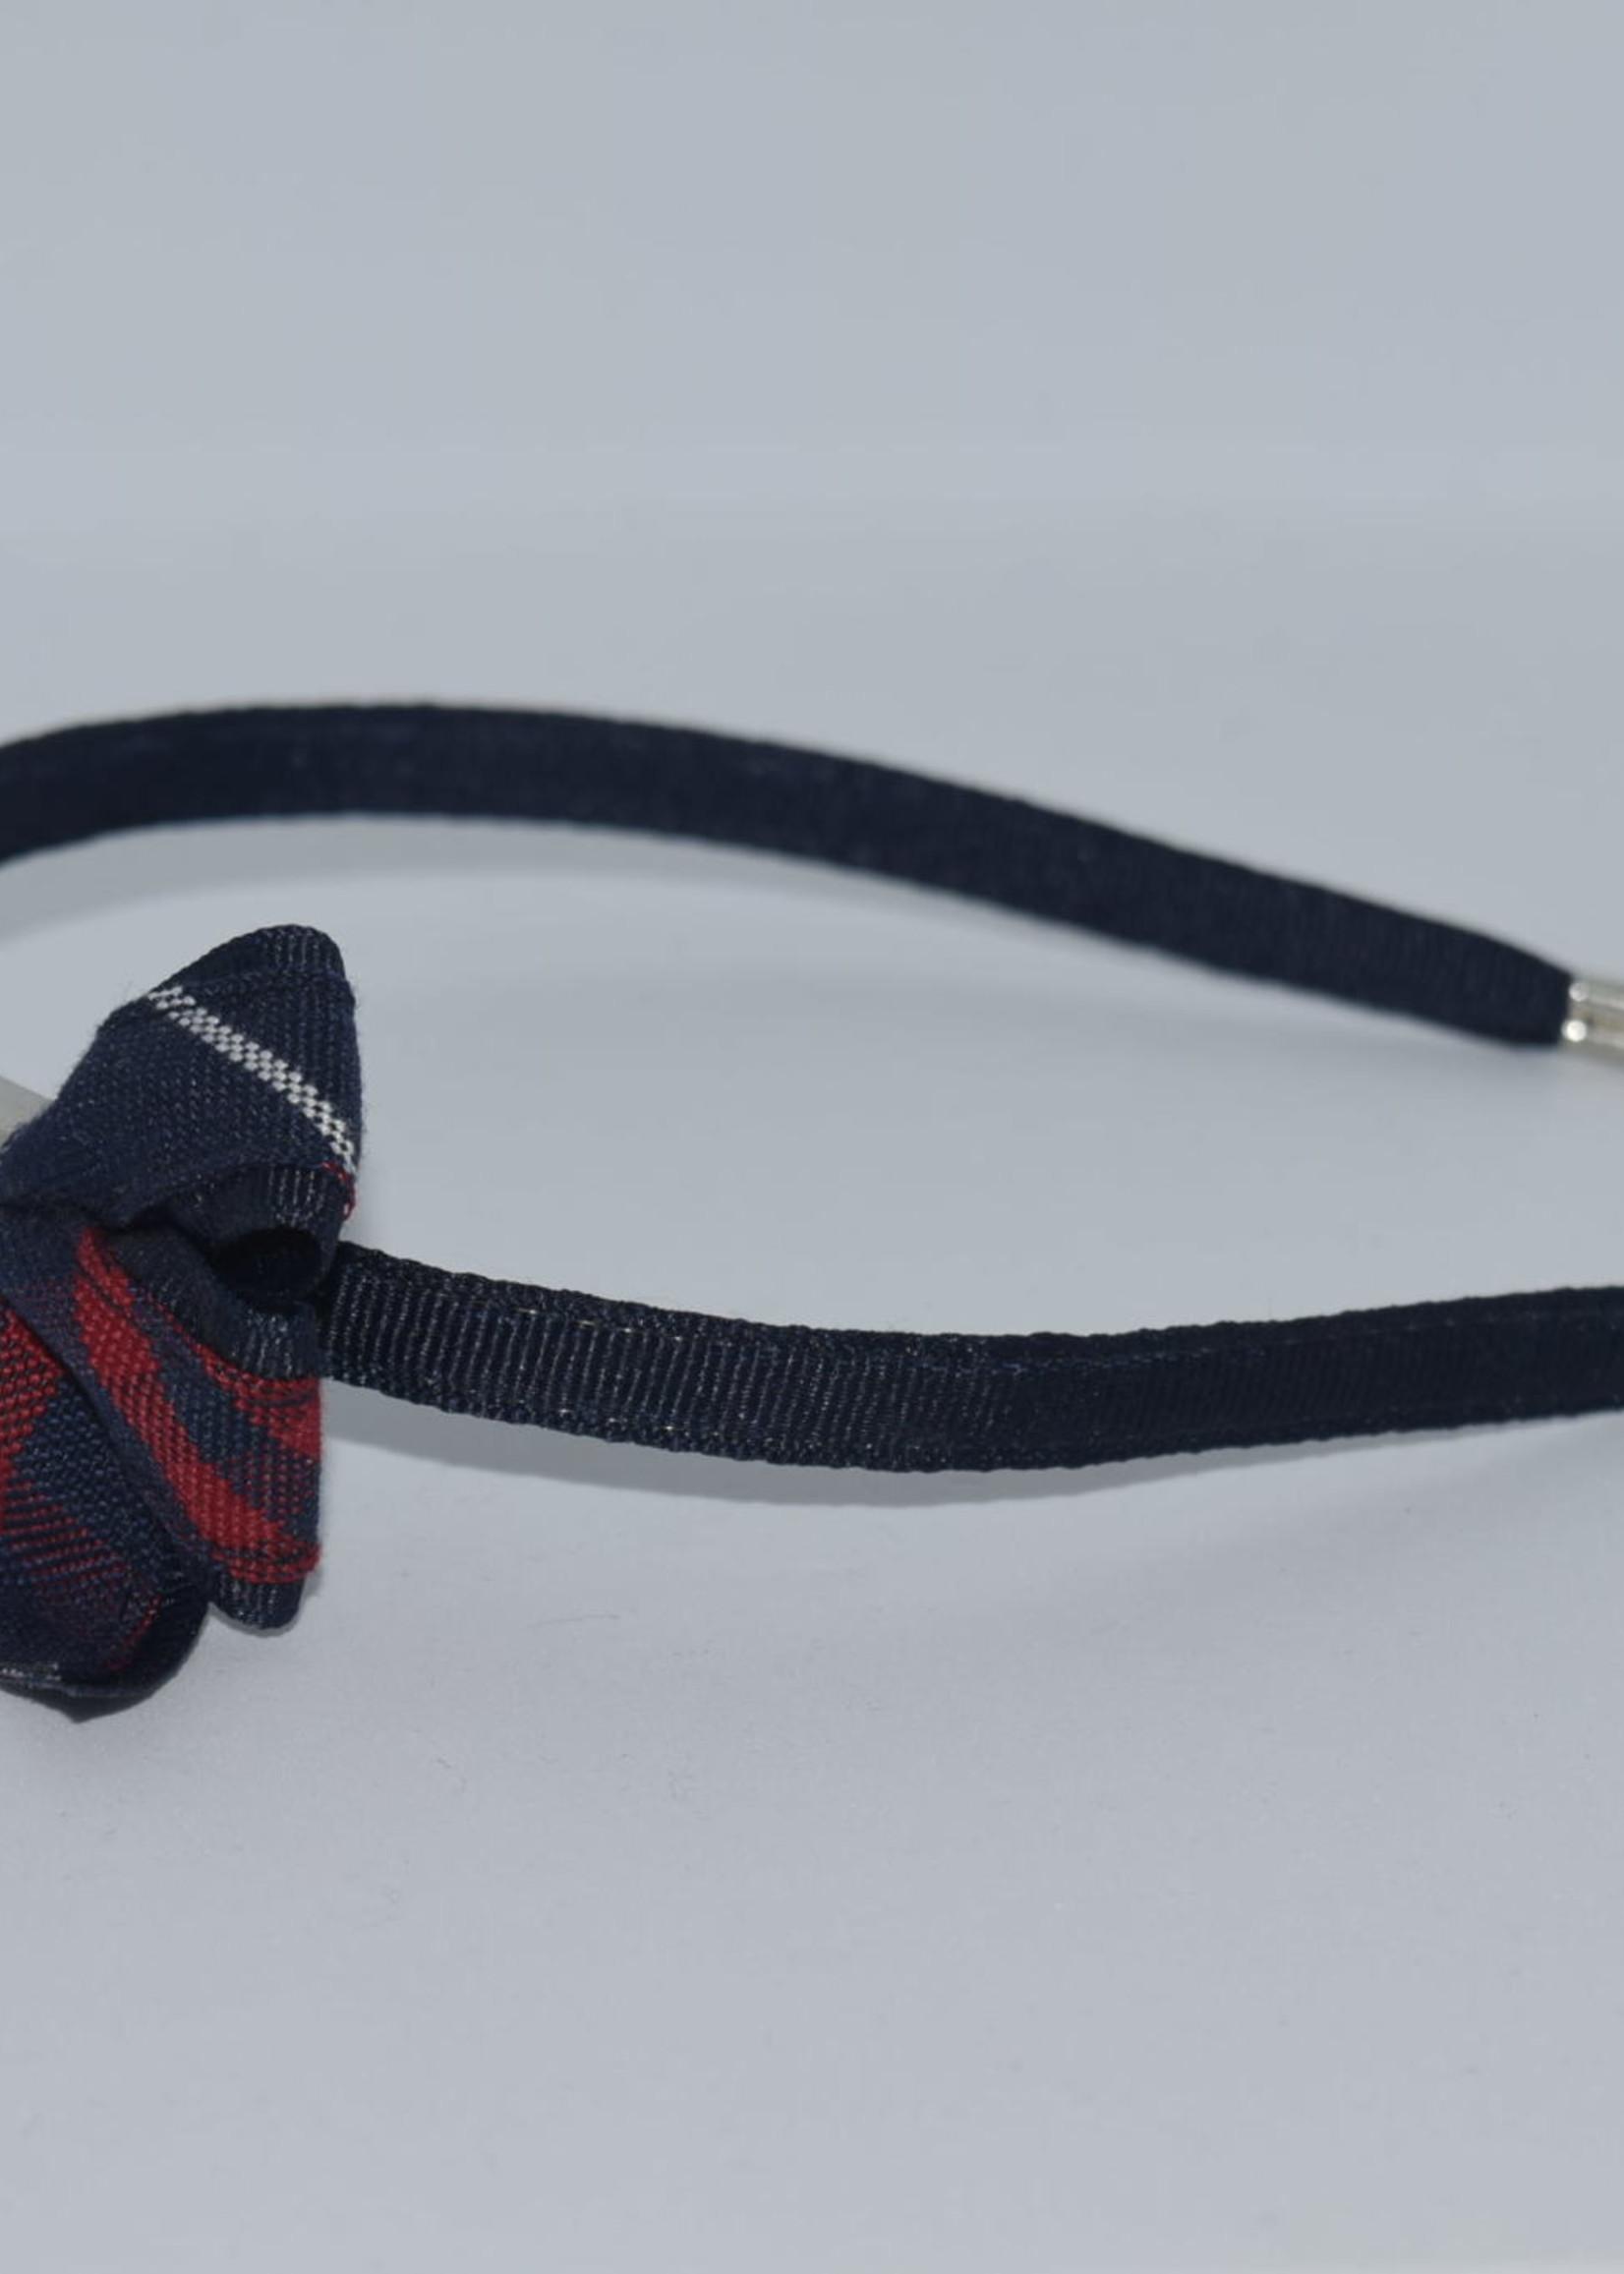 Mini Monarch Bow on covered Headband P36